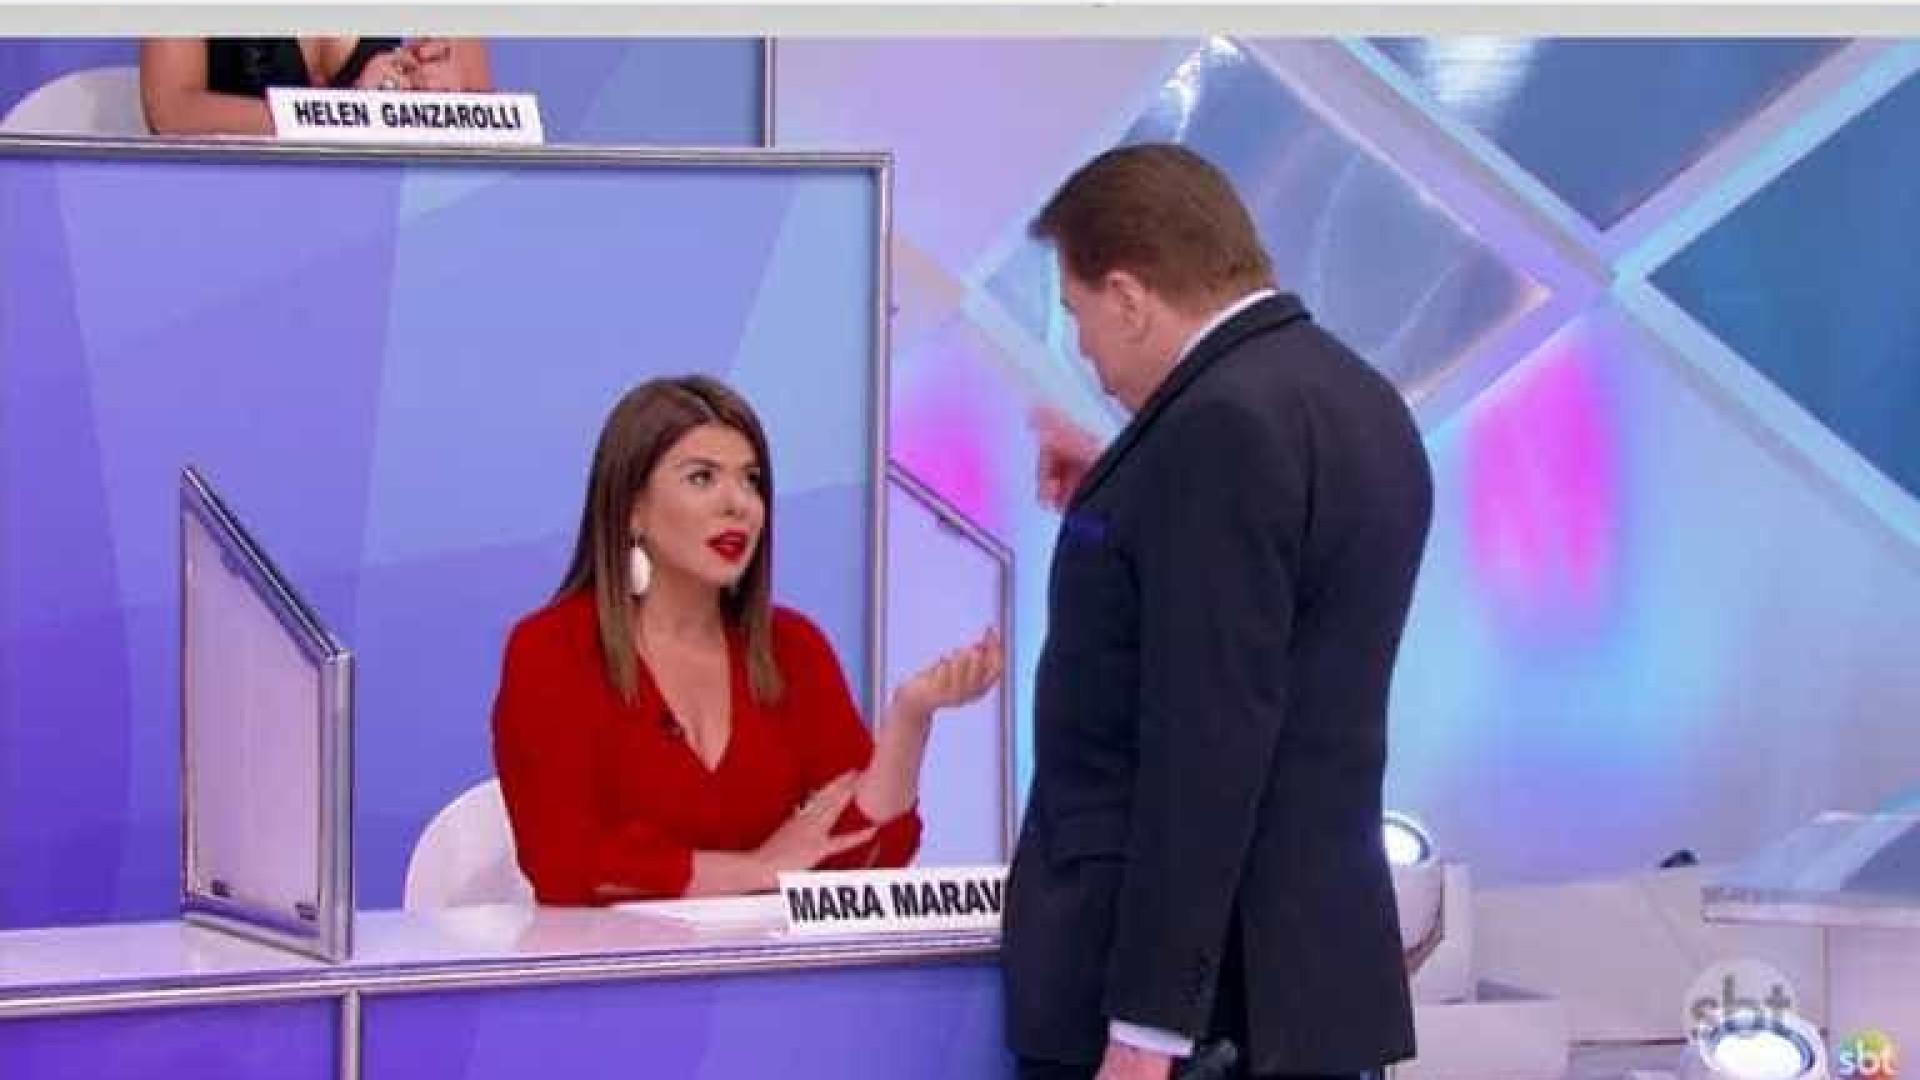 Silvio Santos alfineta Mara Maravilha: 'Ninguém suporta'